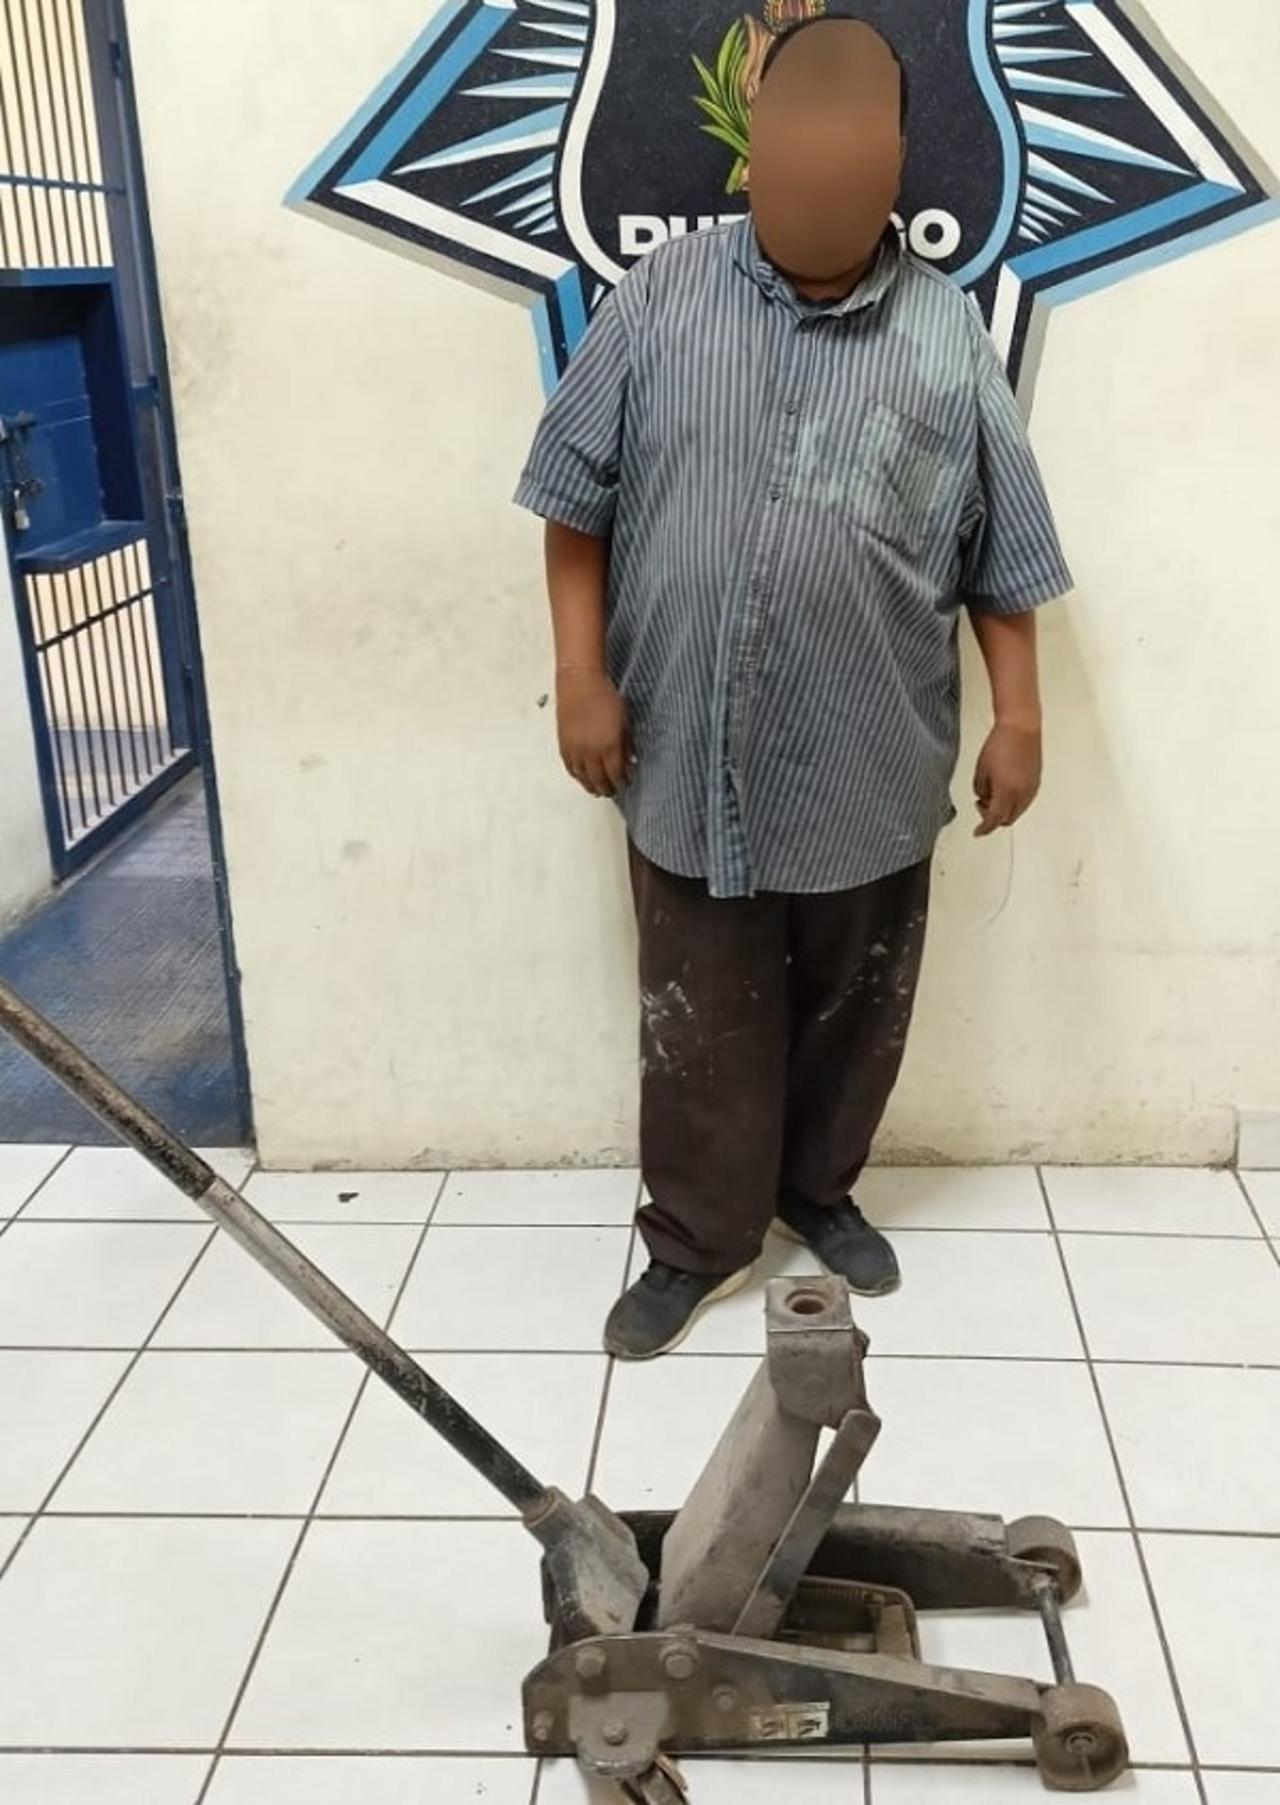 Detienen a presunto ladrón de taller mecánico